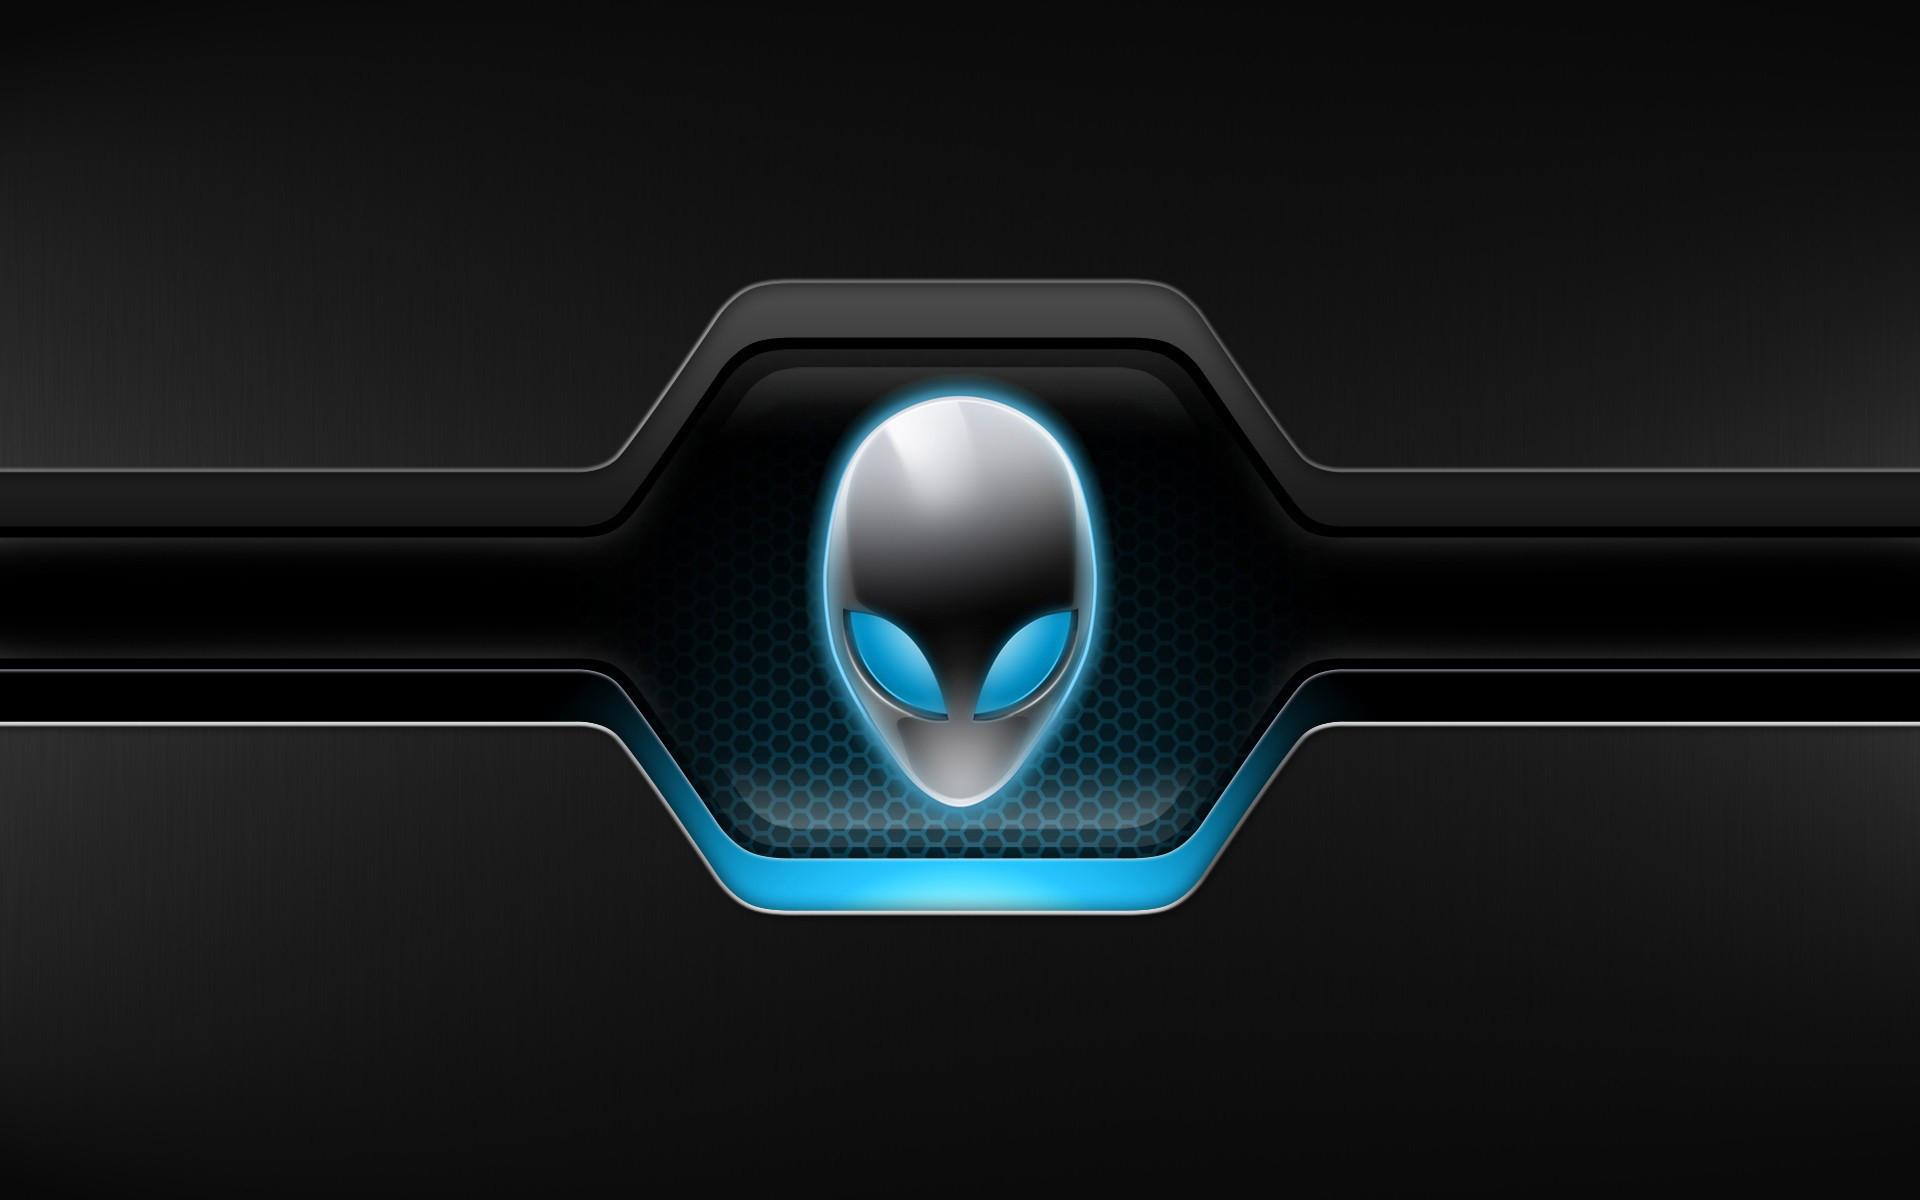 Alienware Wallpapers Hd 1920×1080 8117 Alienware Wallpapers Hd ..